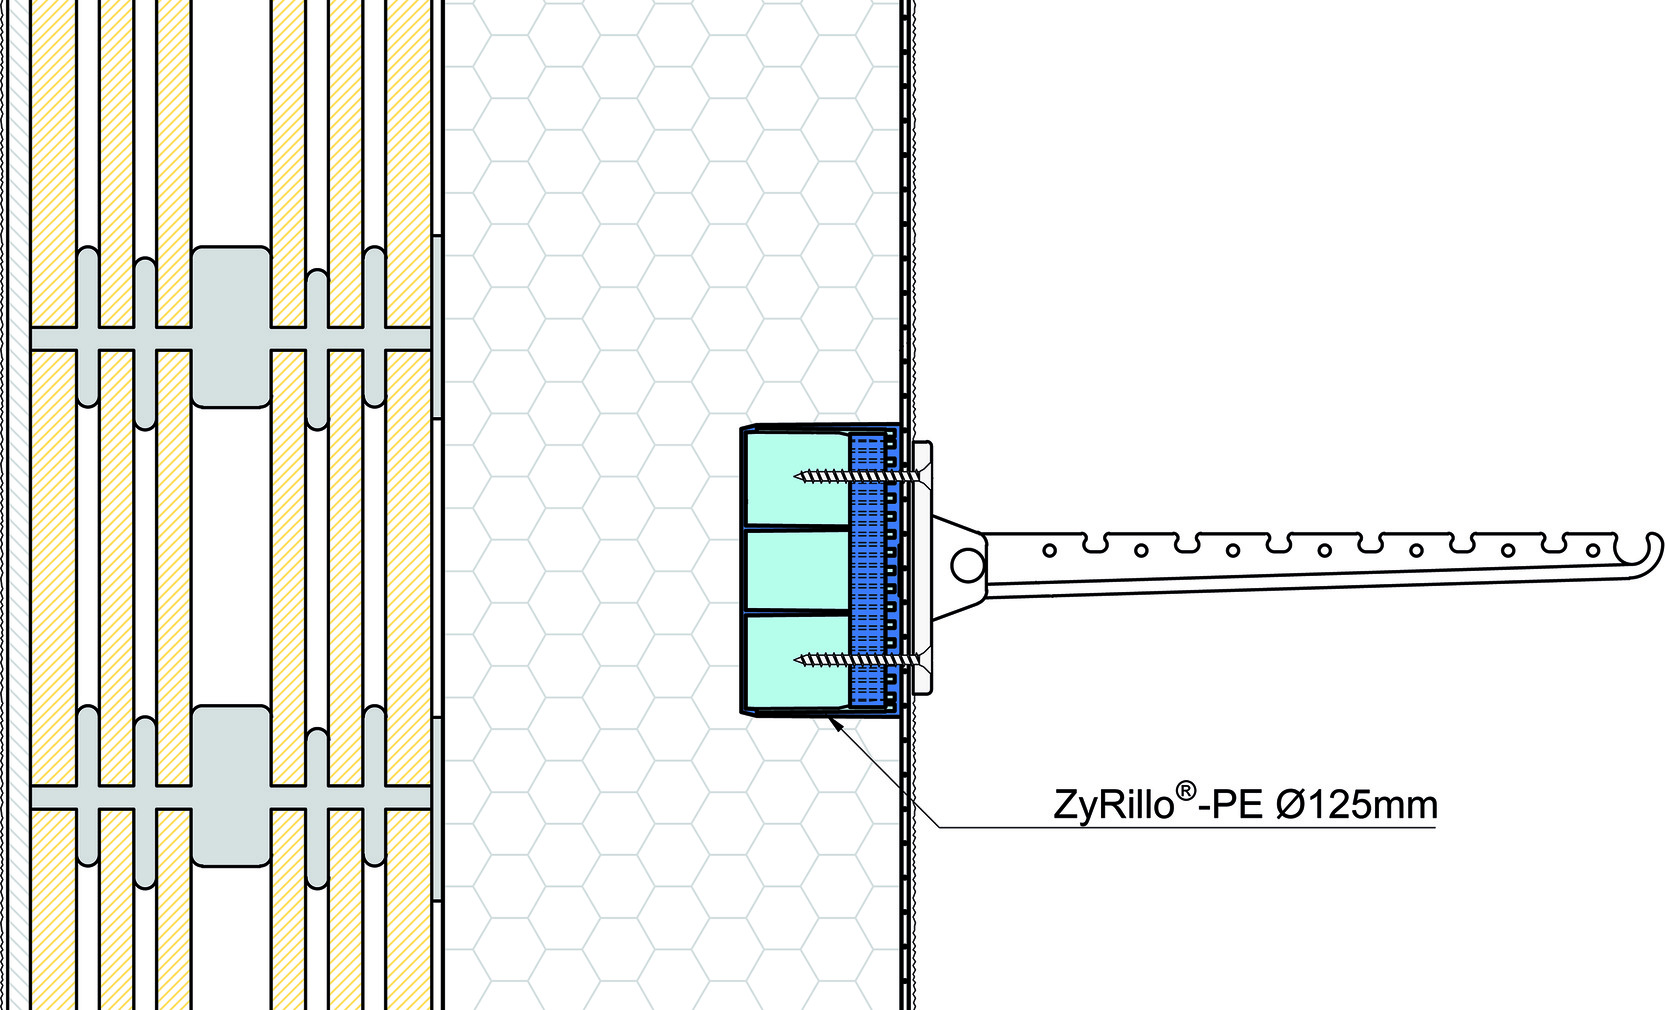 Montagezylinder ZyRillo-PE